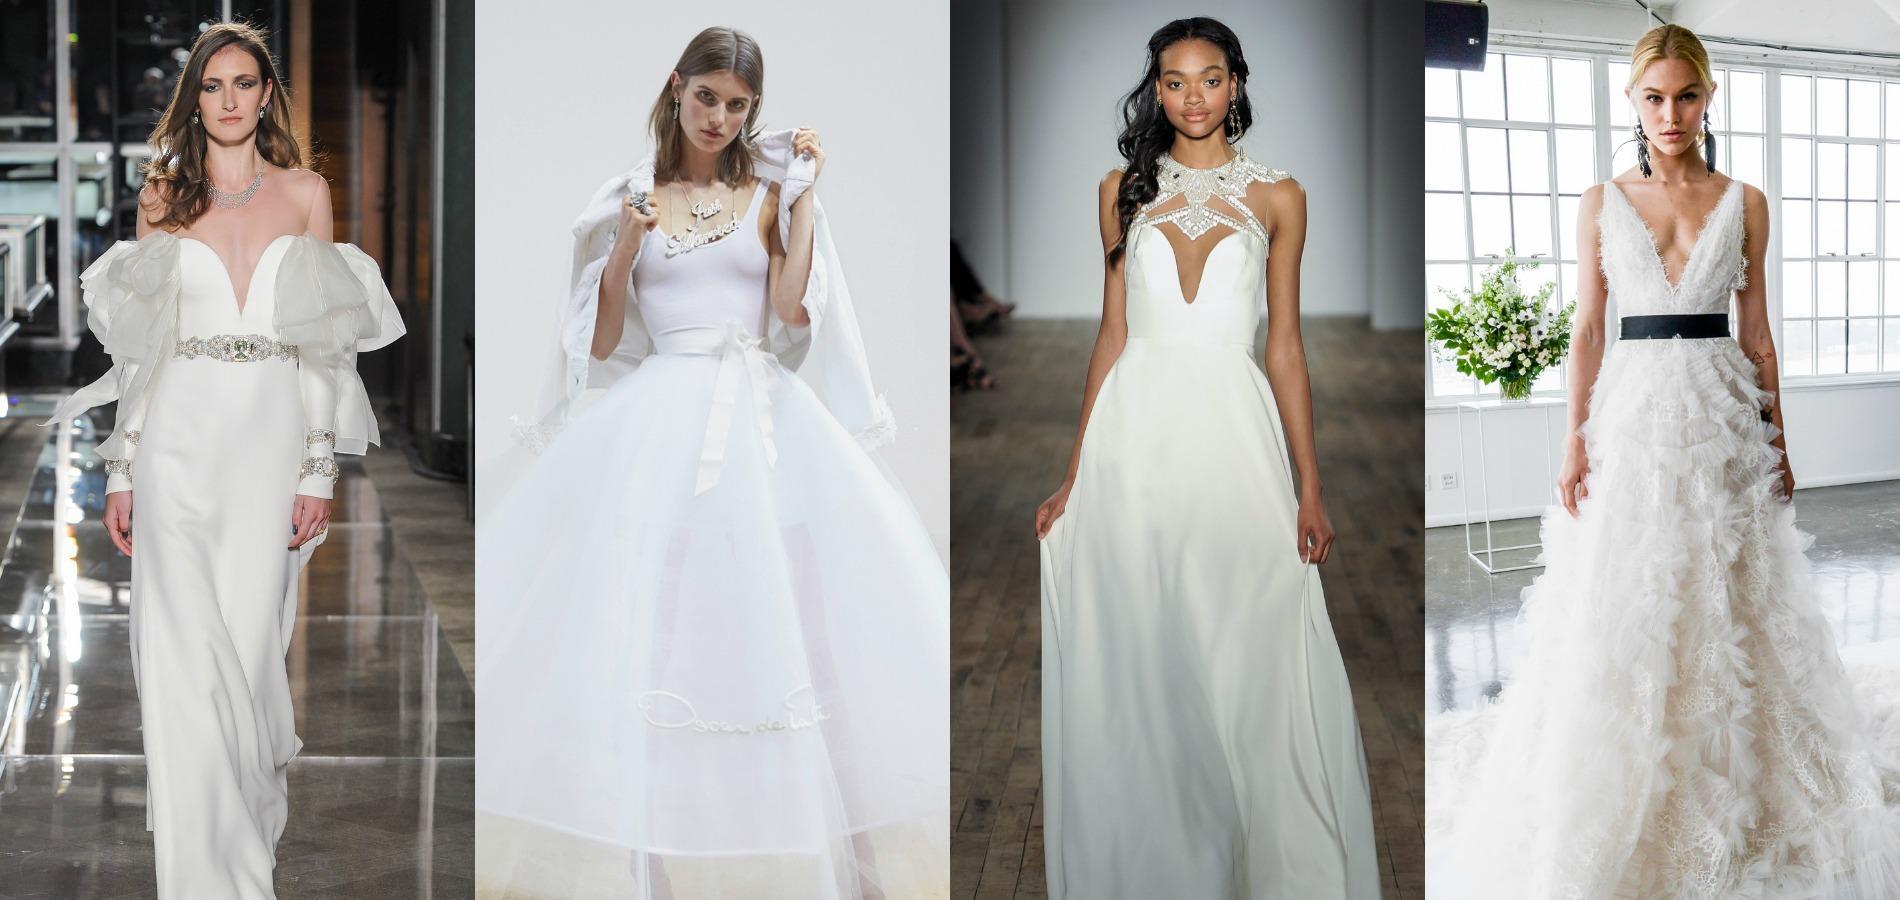 bridal week 2018 les tendances fortes des d fil s robes de mari e d crypt es madame figaro. Black Bedroom Furniture Sets. Home Design Ideas